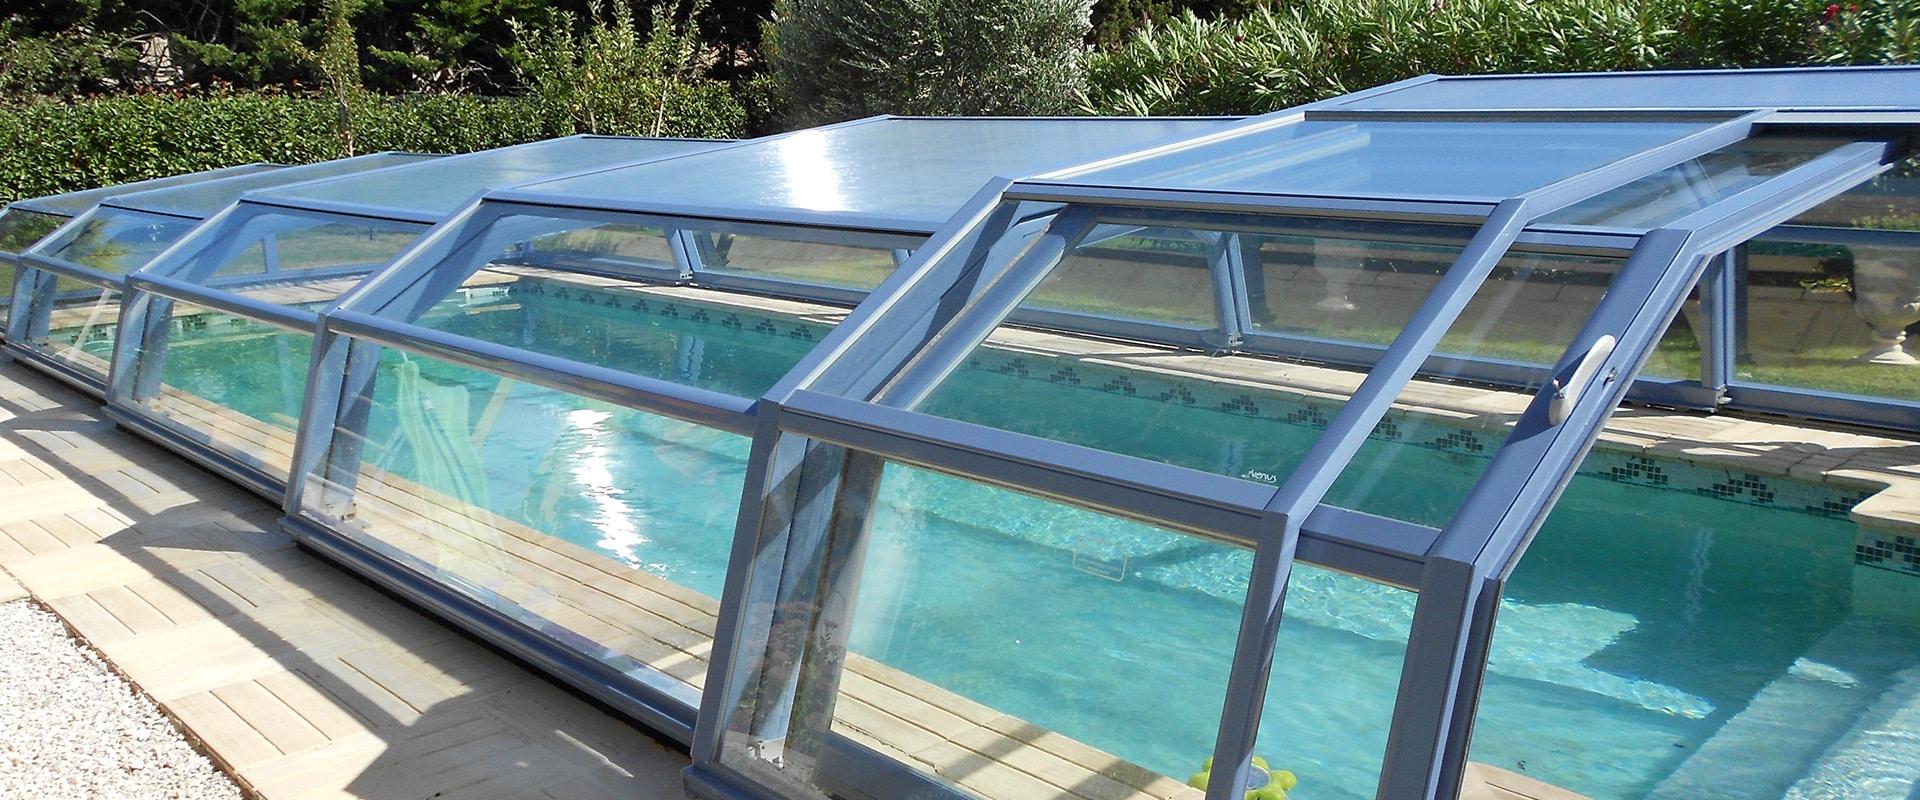 abris de piscine t lescopique bas ondine abri piscine bas. Black Bedroom Furniture Sets. Home Design Ideas